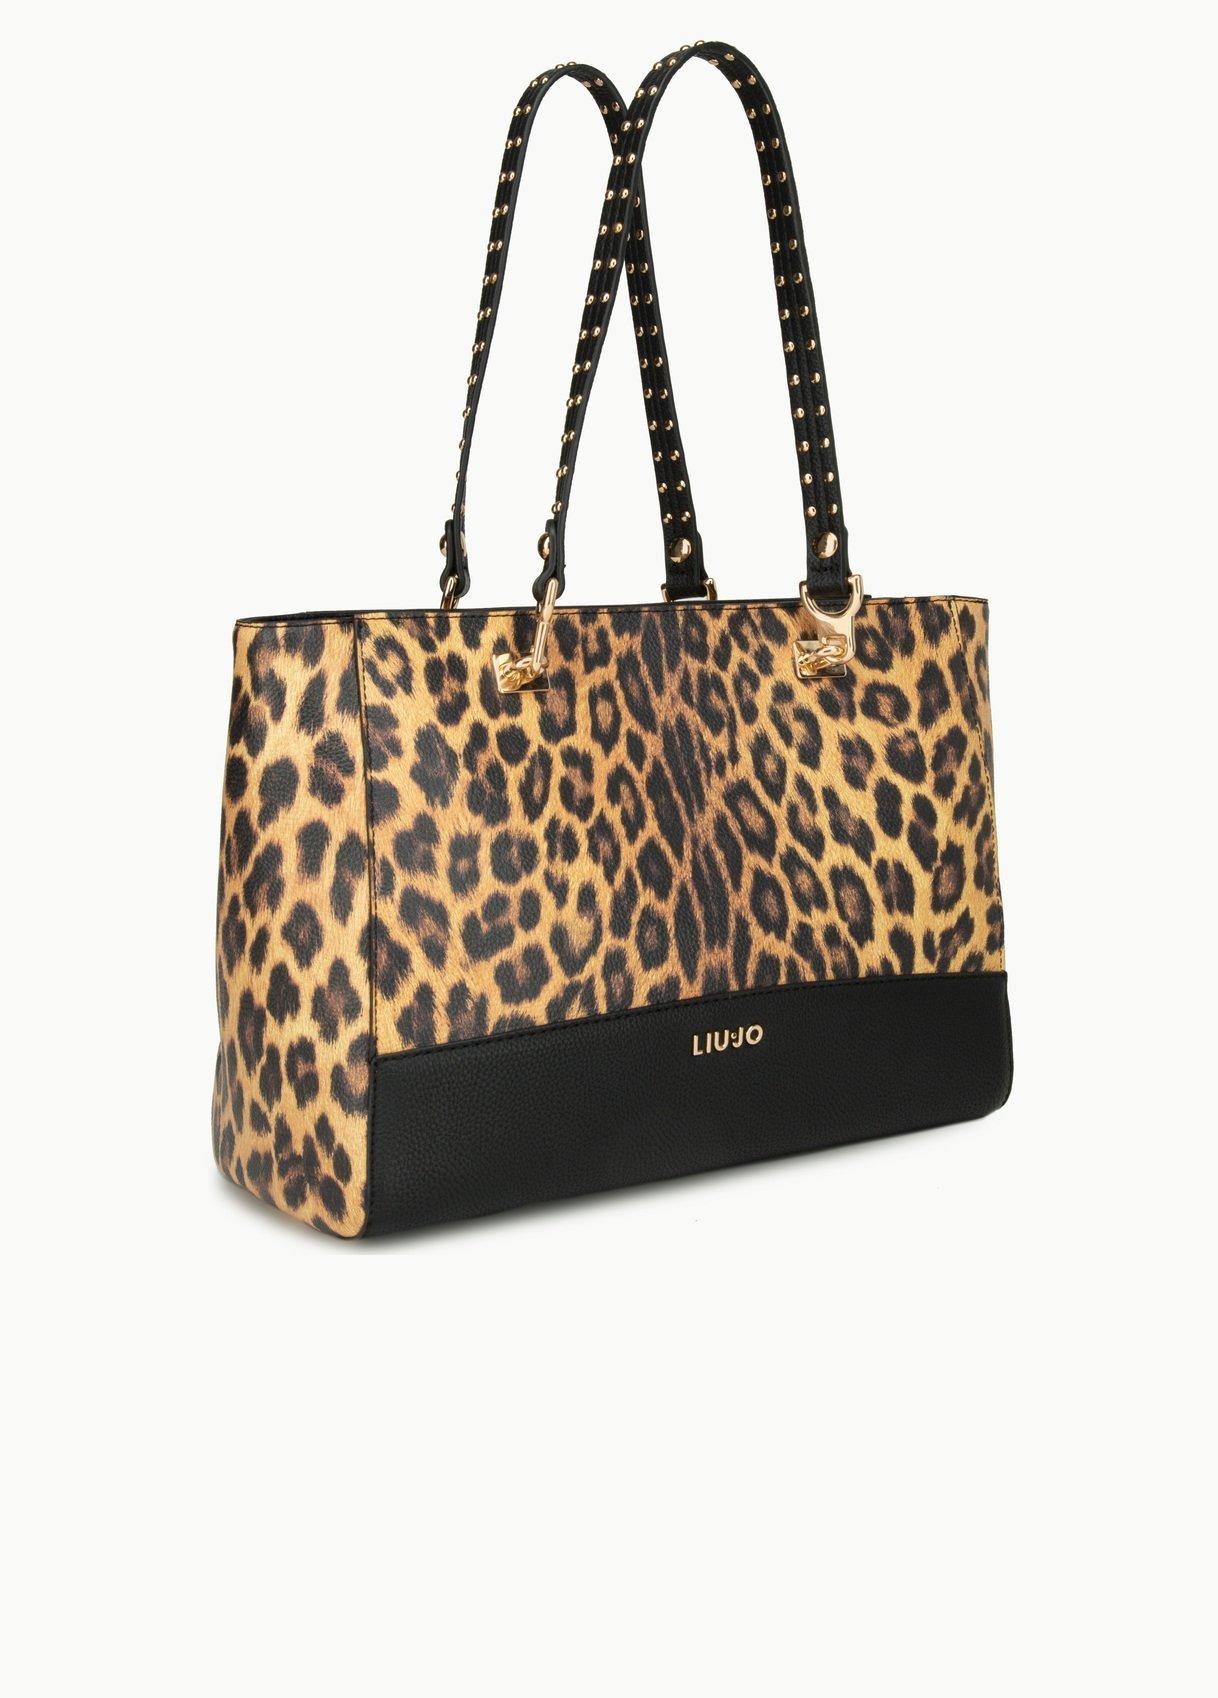 Shopping bag maculata Liu Jo prezzo 179 euro